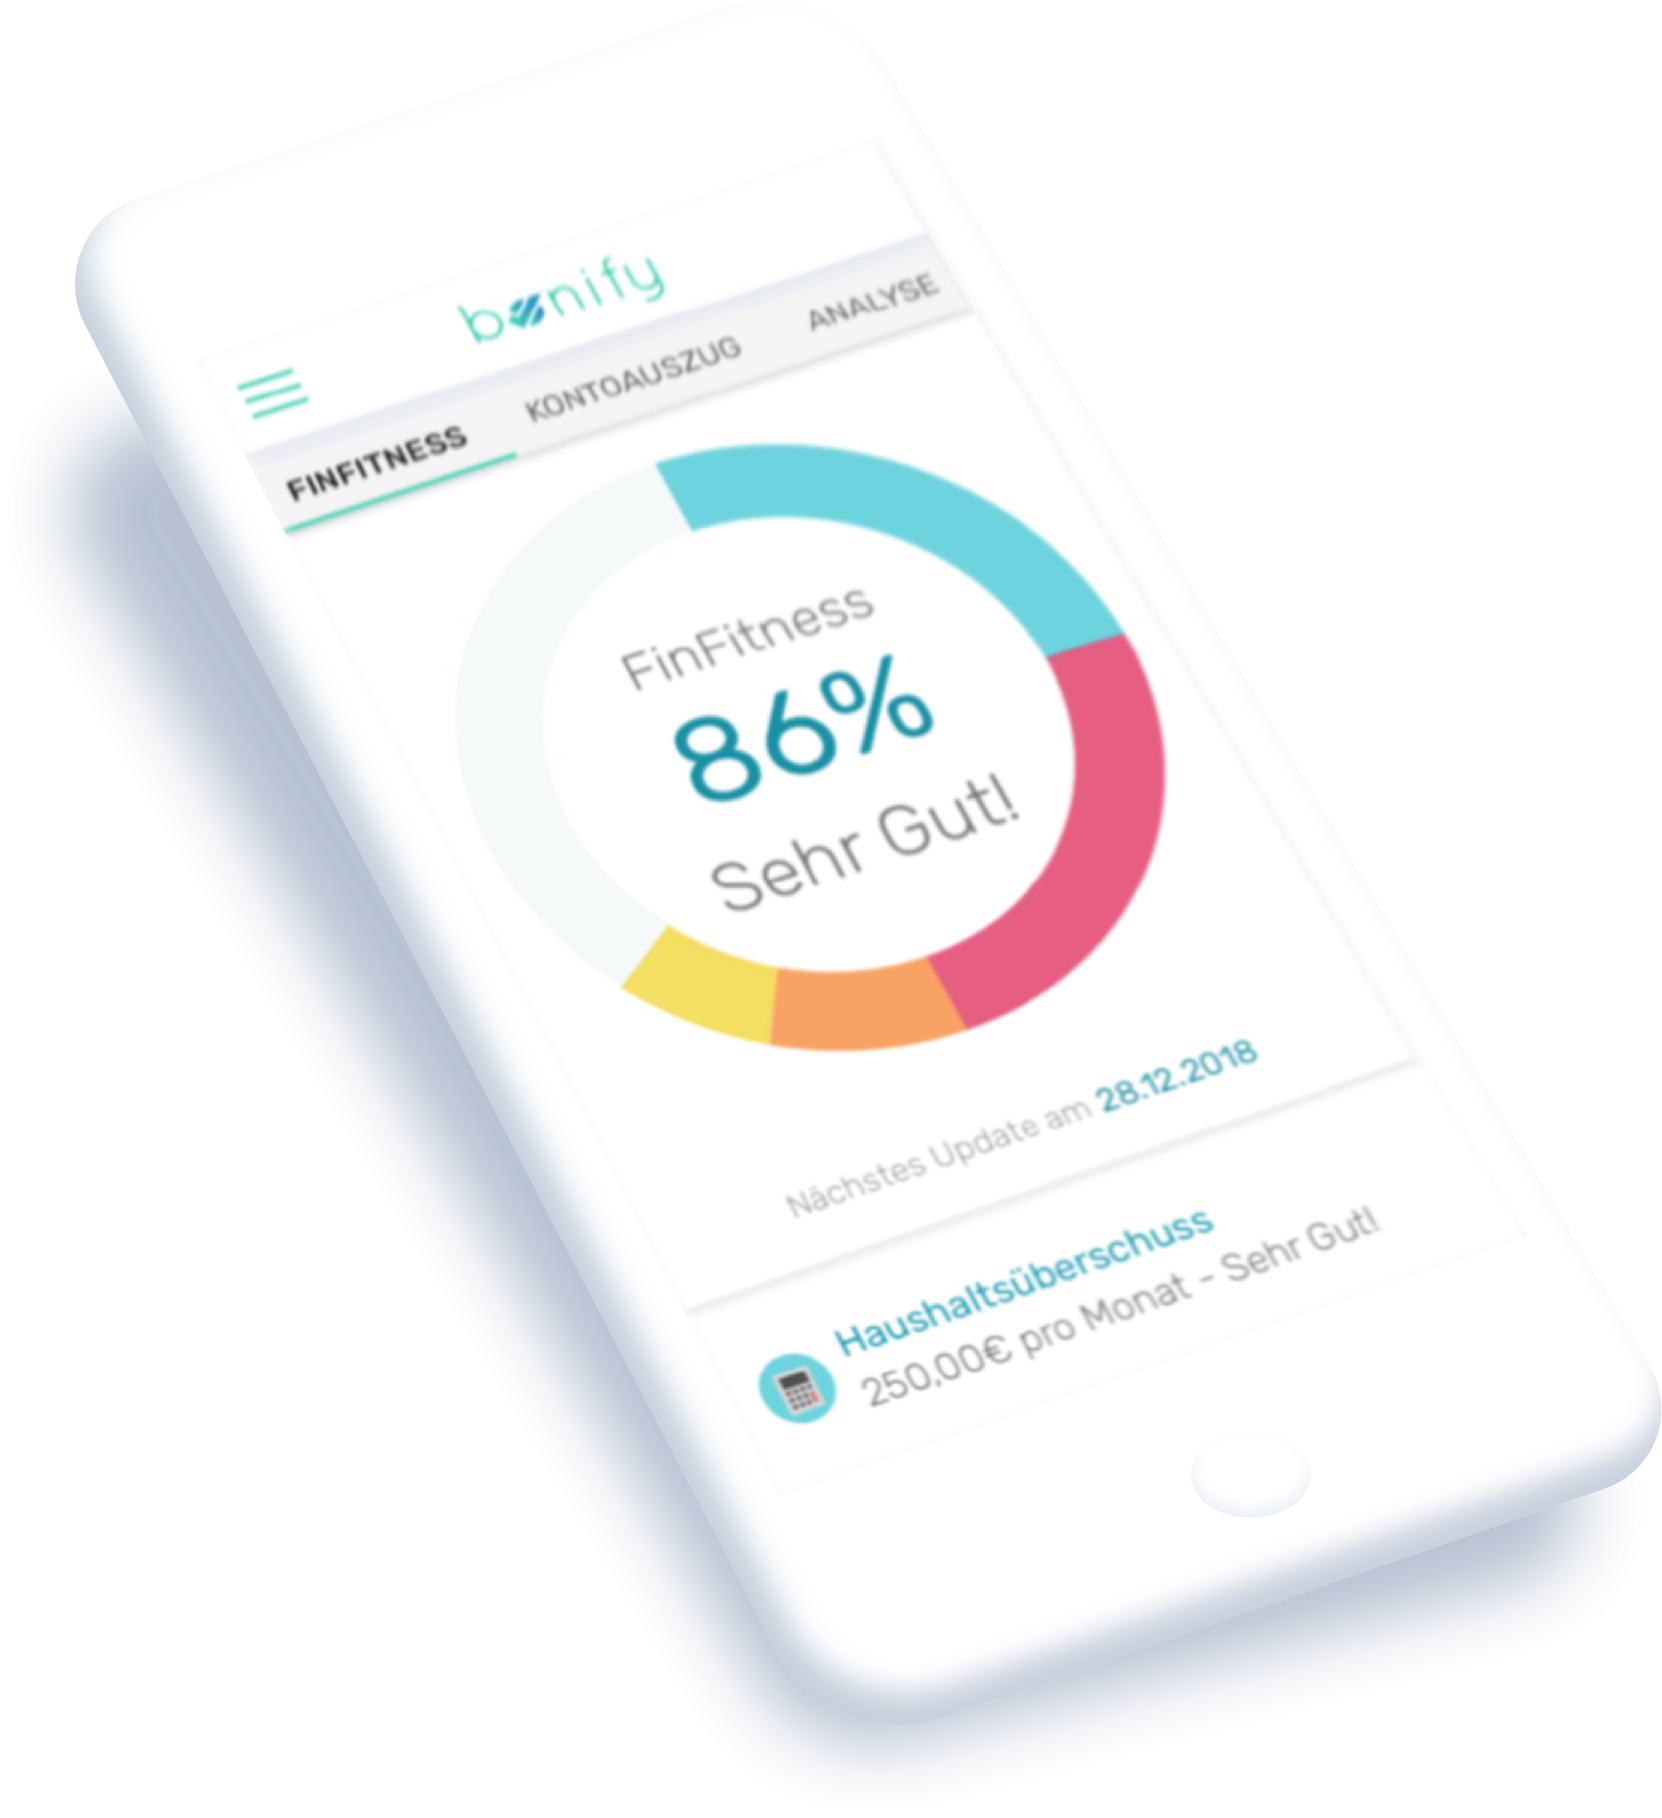 Finfitness Phone Dashboard